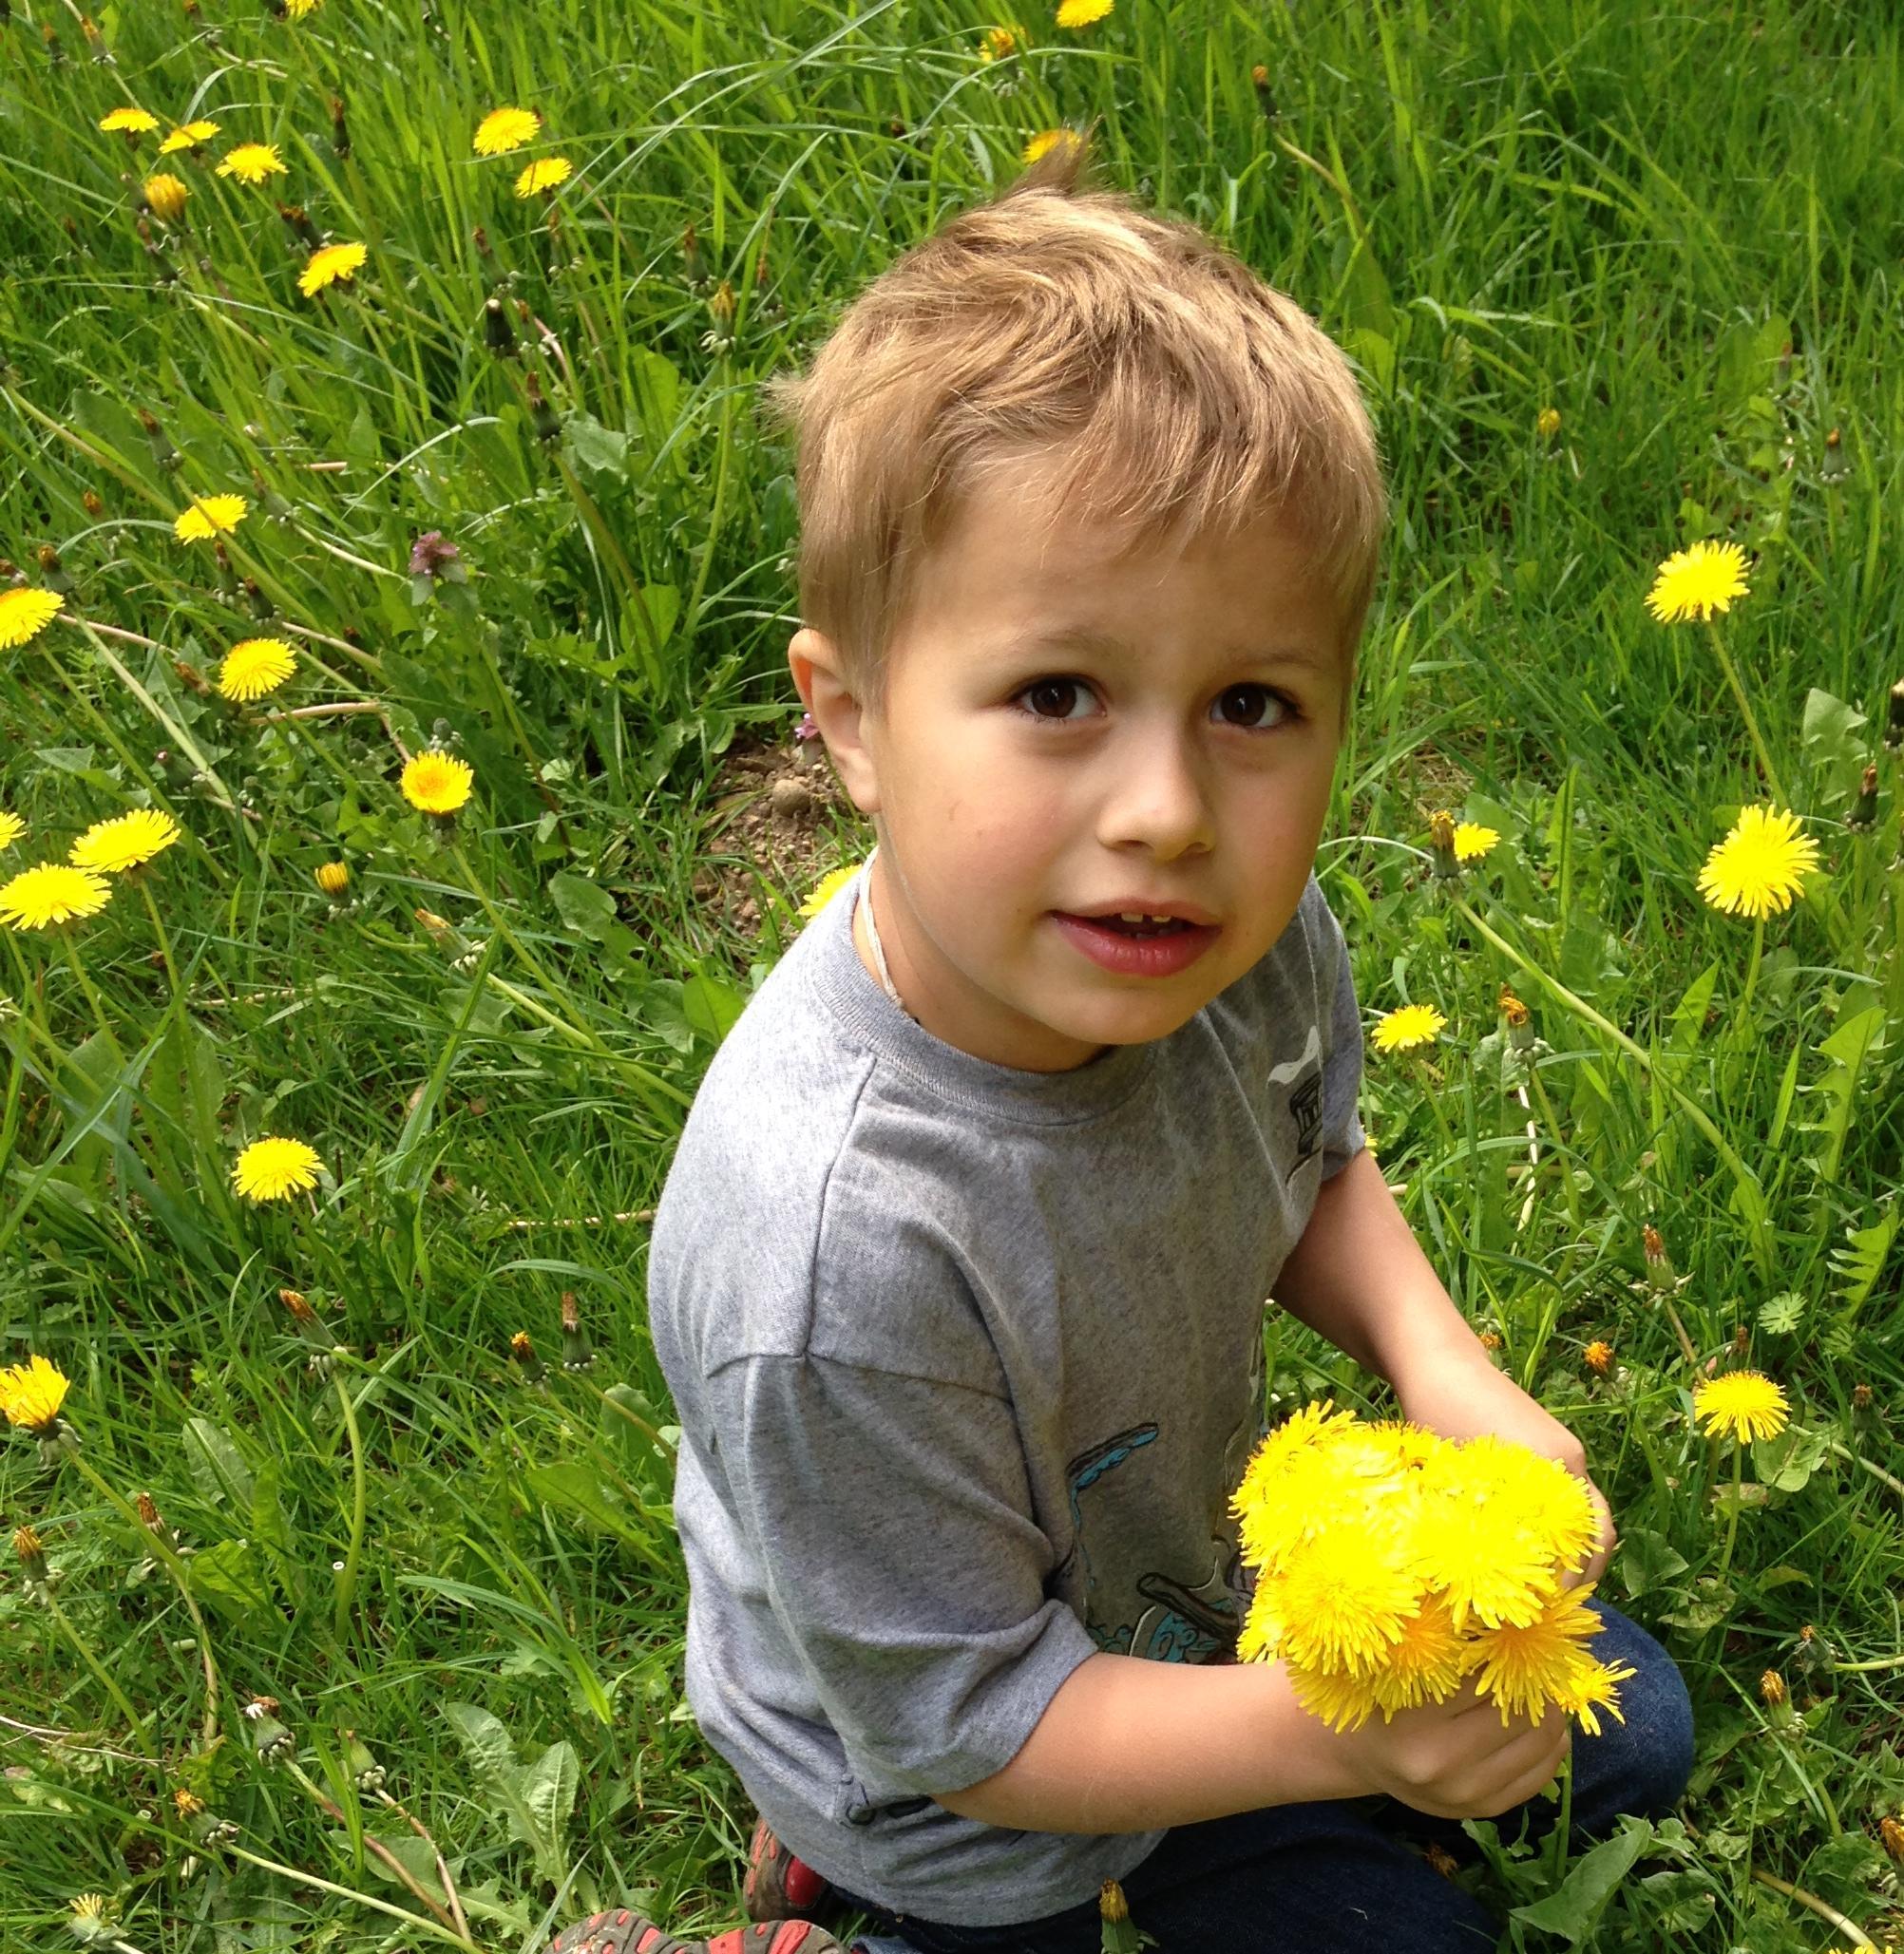 AMBER alert called off, six-year-old boy found safe